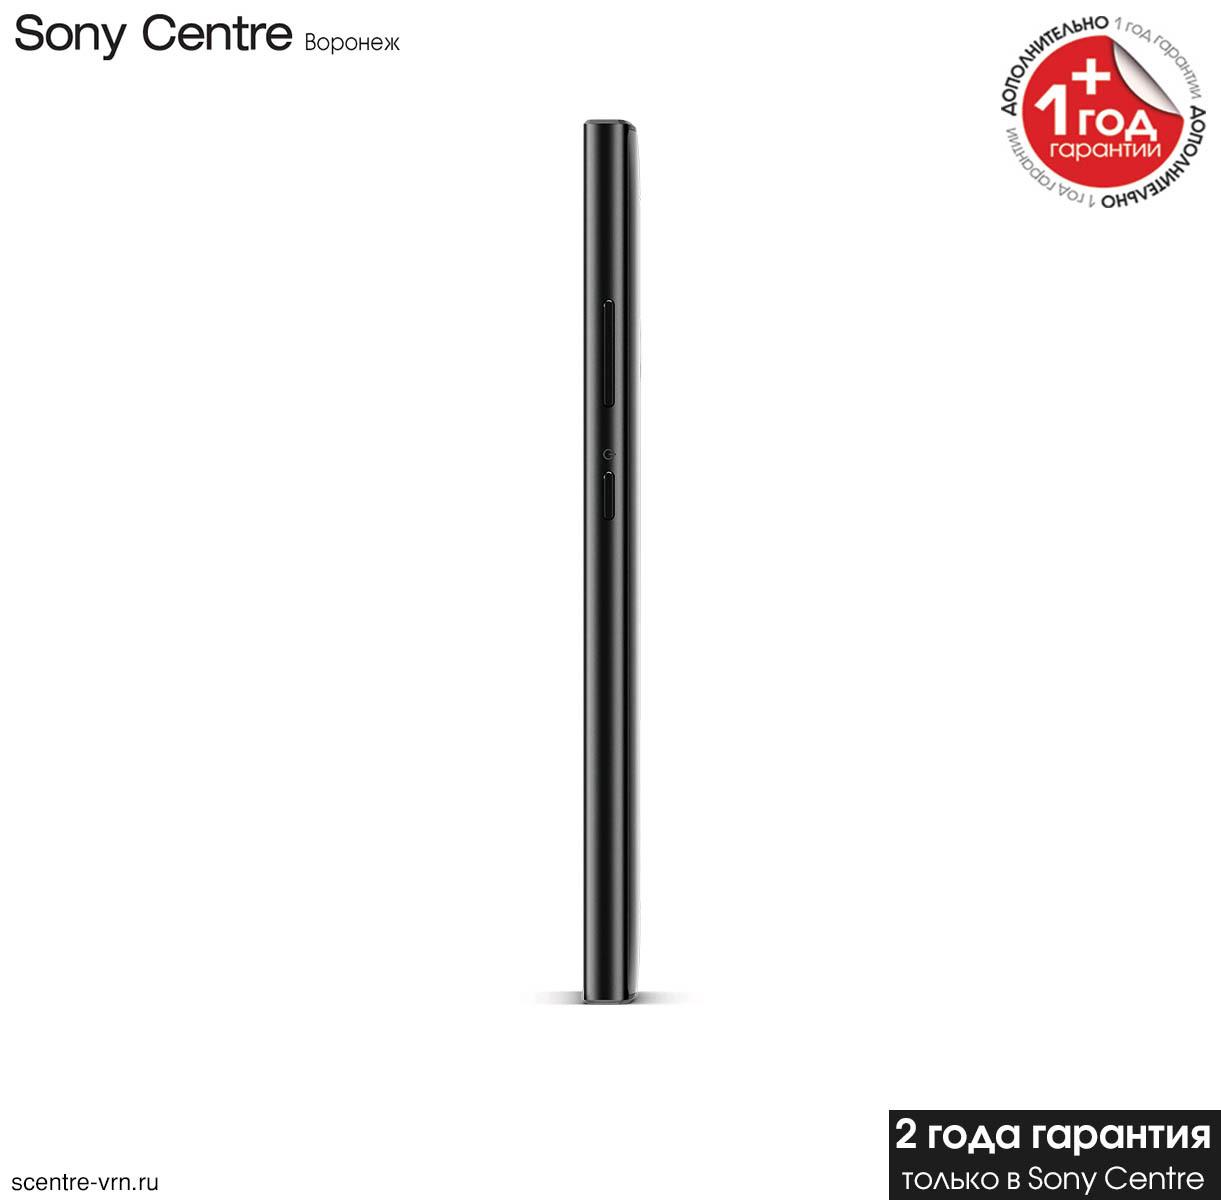 H4311/B смартфон Sony Xperia L2, цвет черный